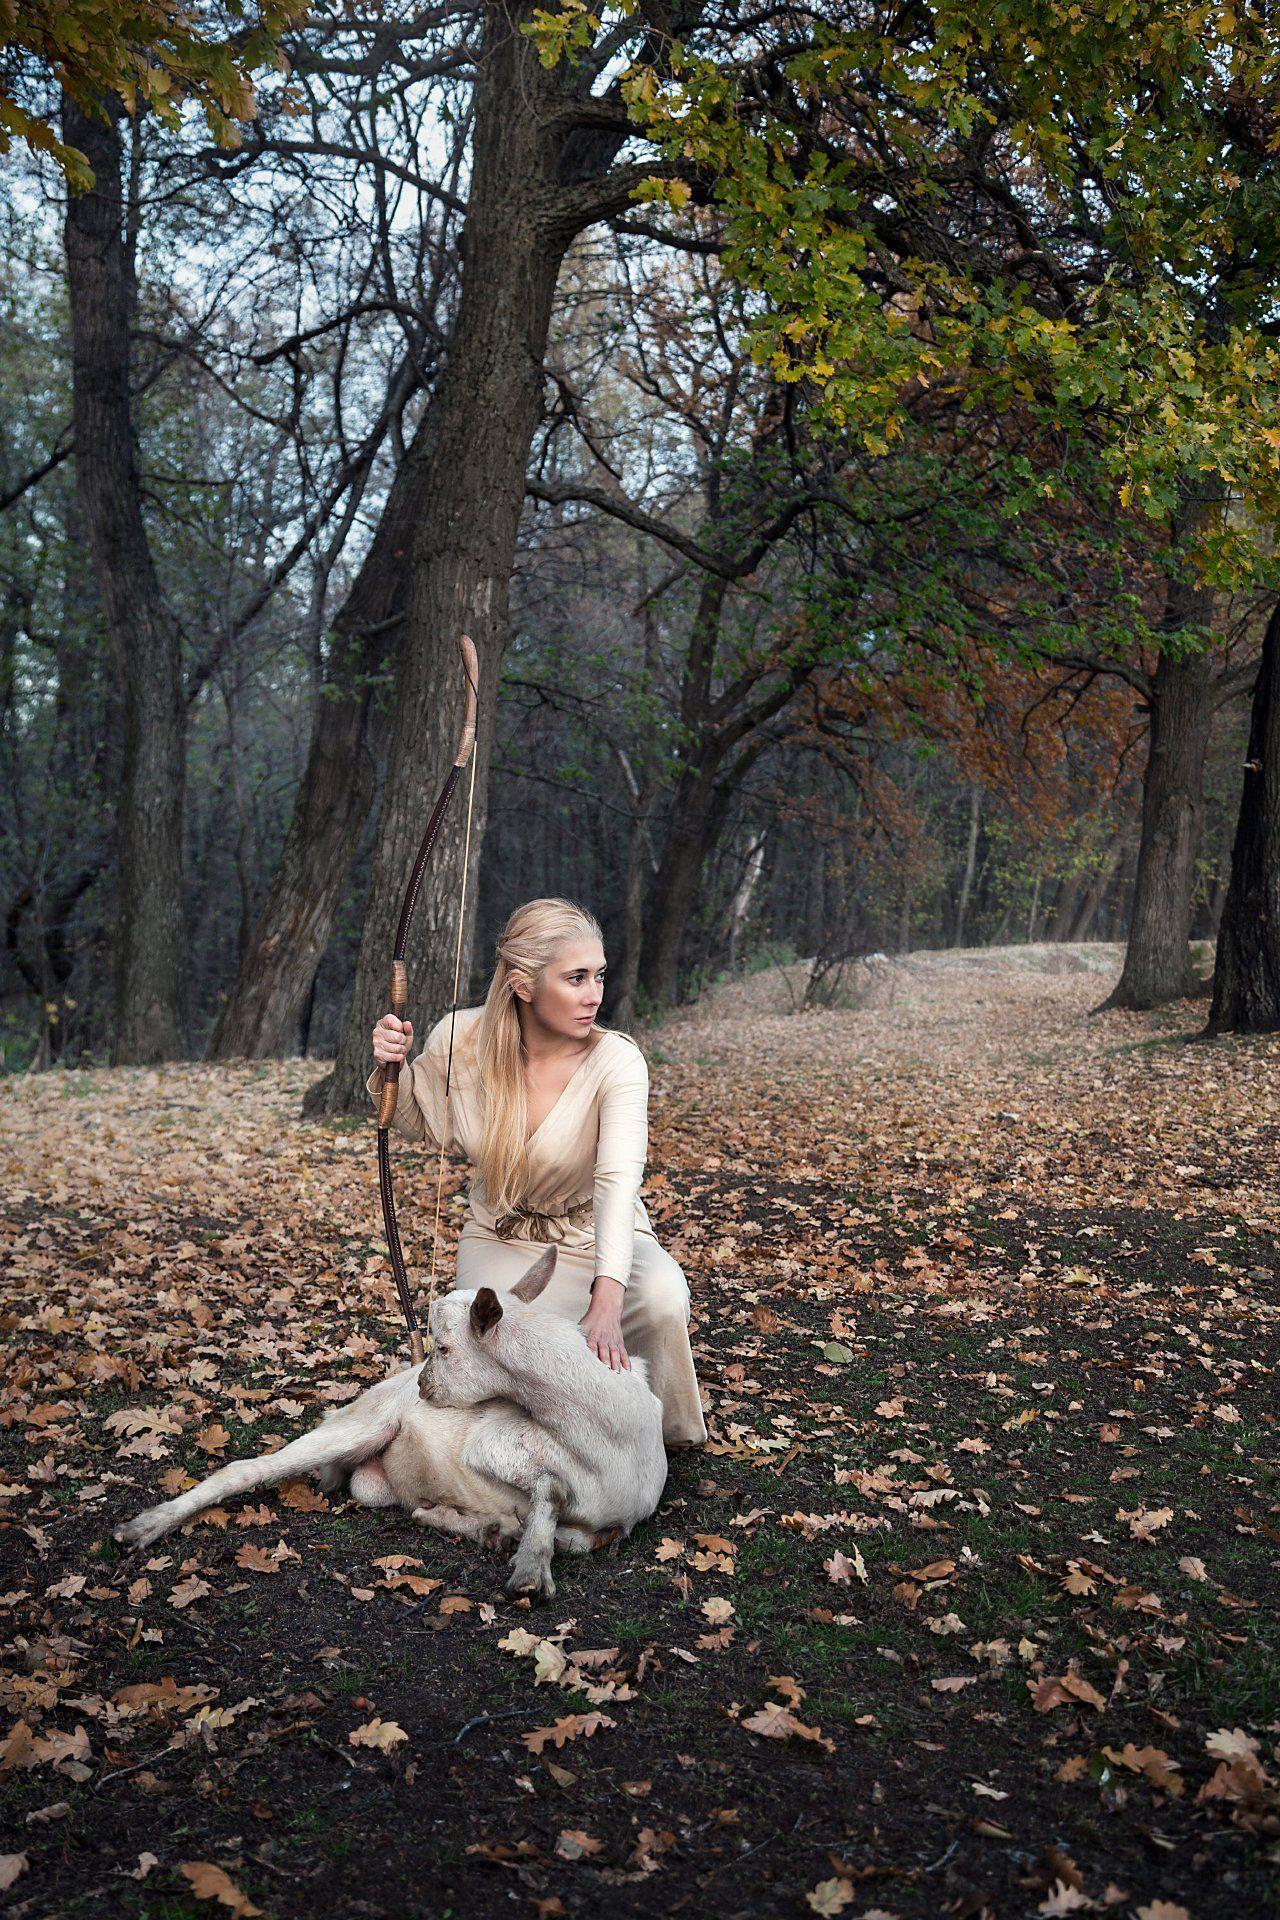 фото , цвет , девушка , портрет , жанр , пастушка , лук , блондинка , козёл , природа, Федотов Вадим(Vadius)